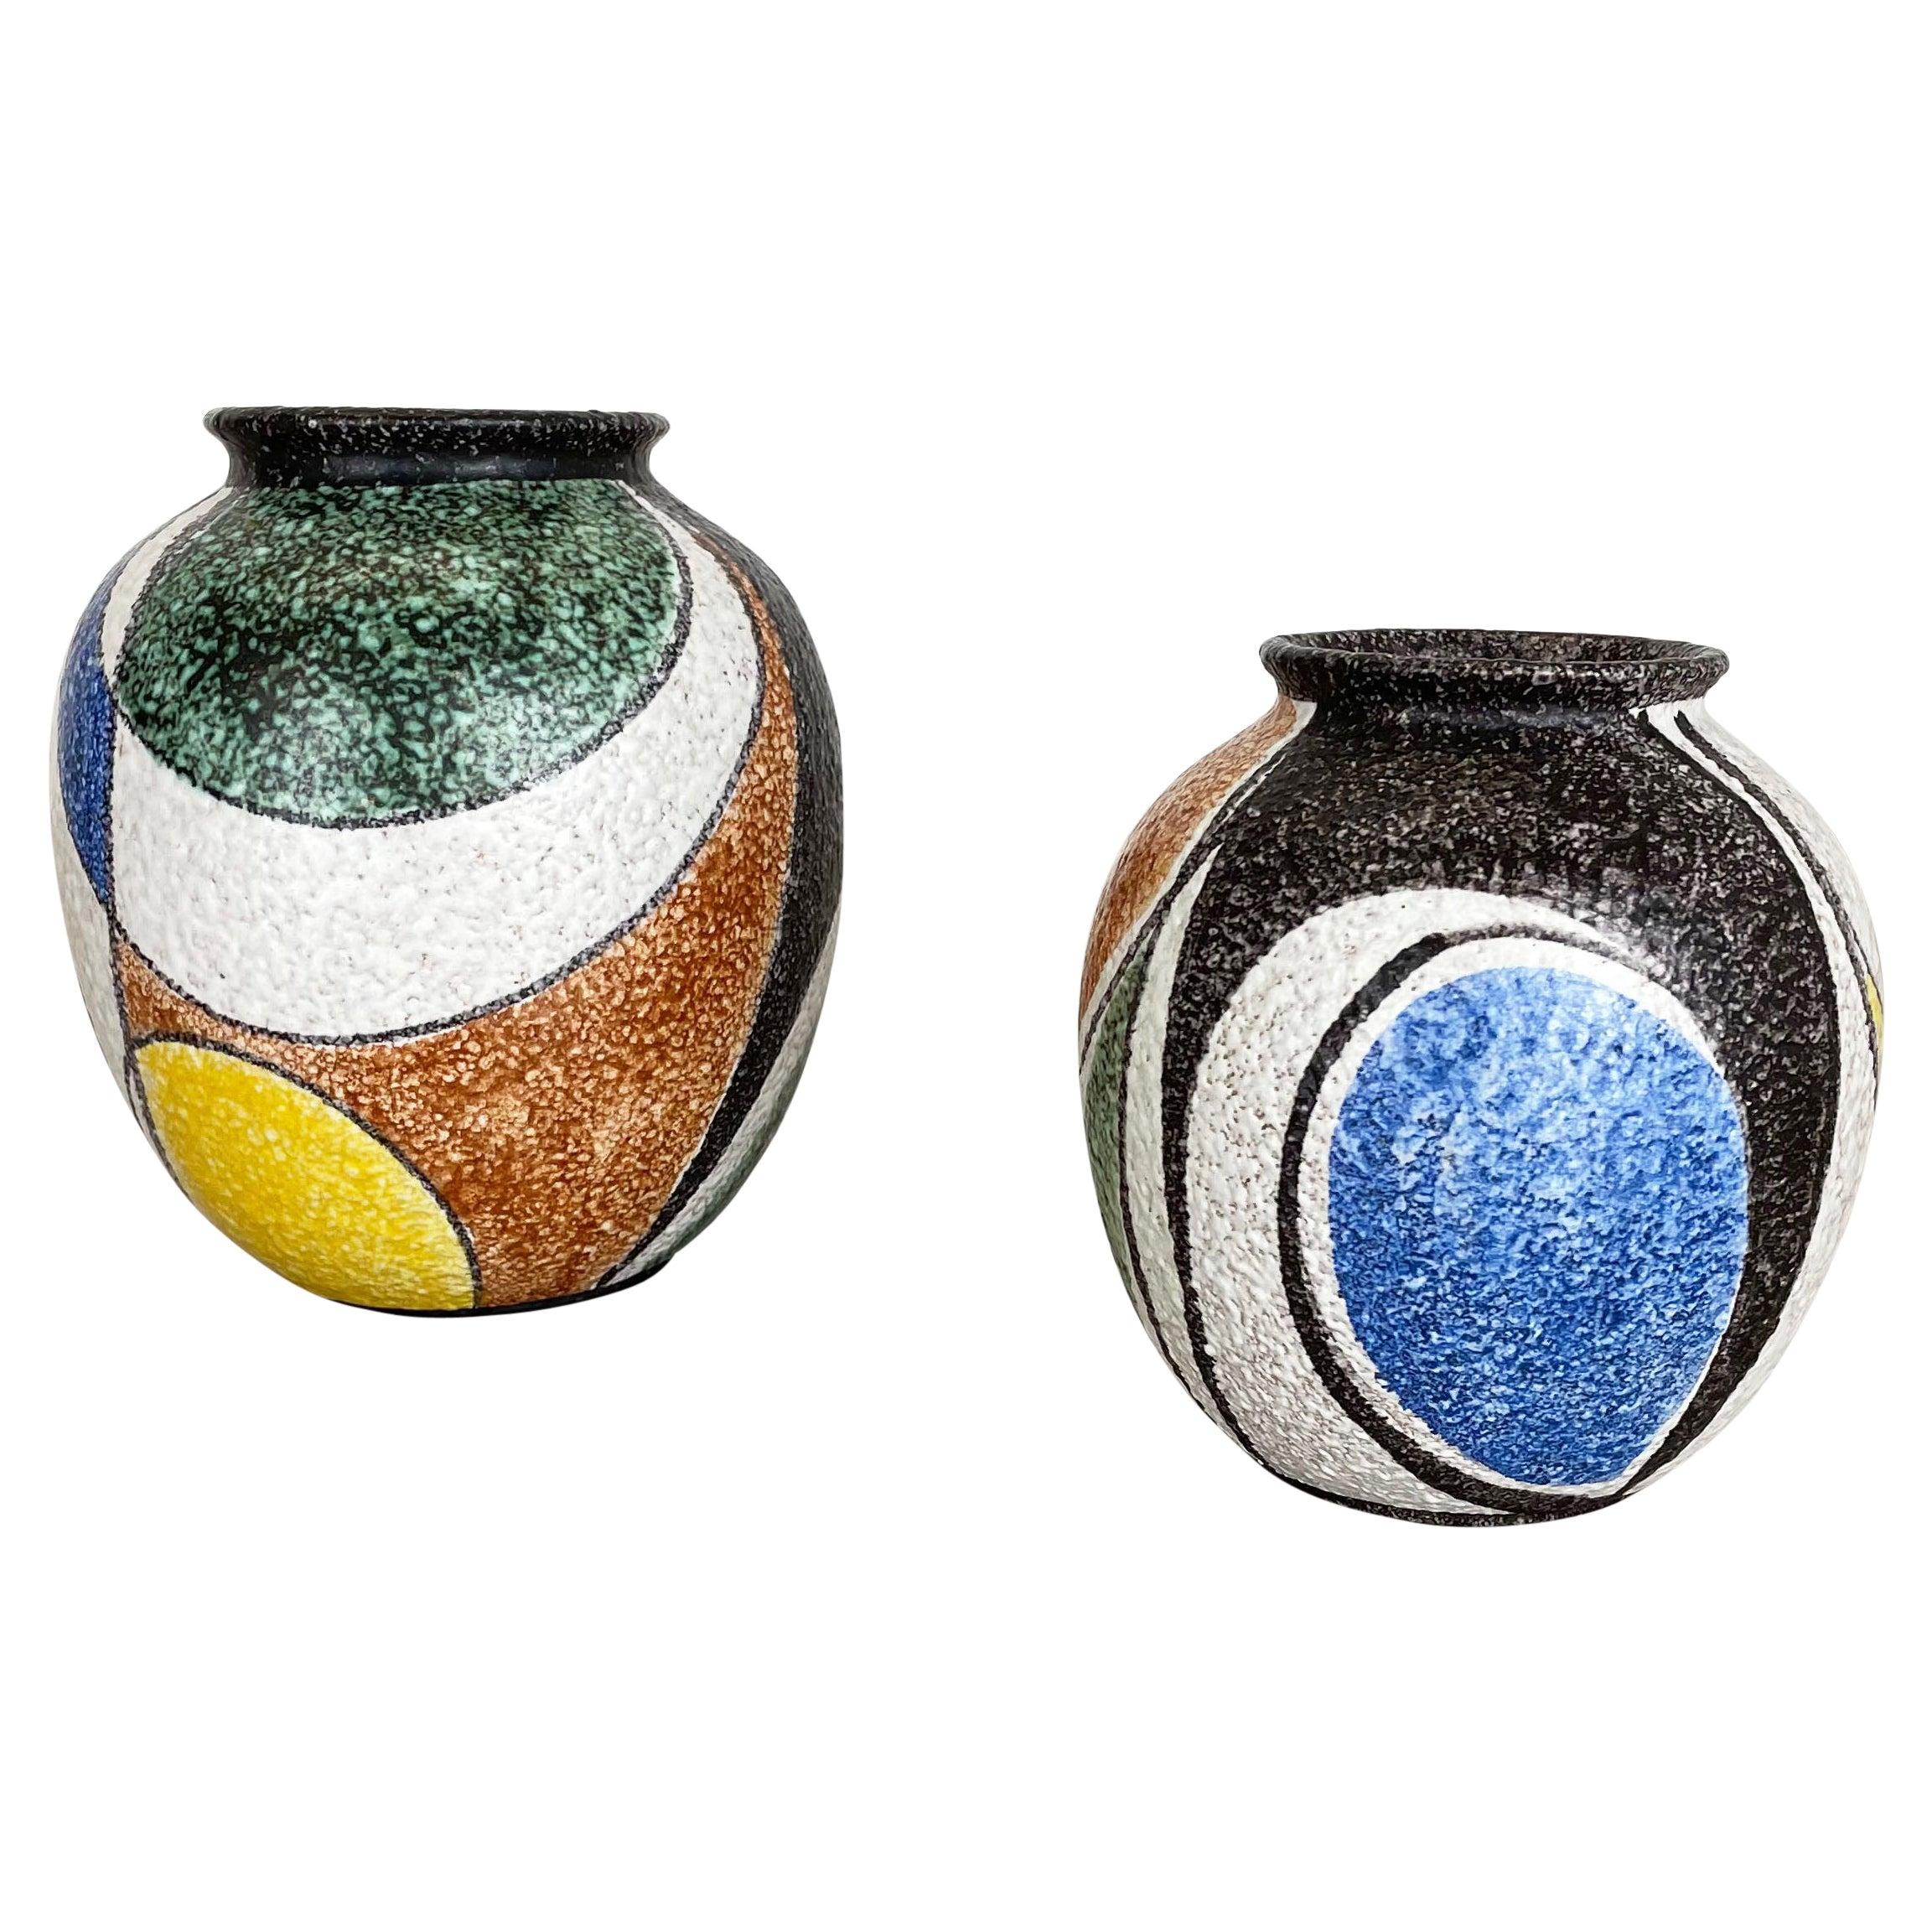 "Set of 2 Vases ""Milano"" Designed by Rudolf Schardt for Ruscha, Germany, 1950s"